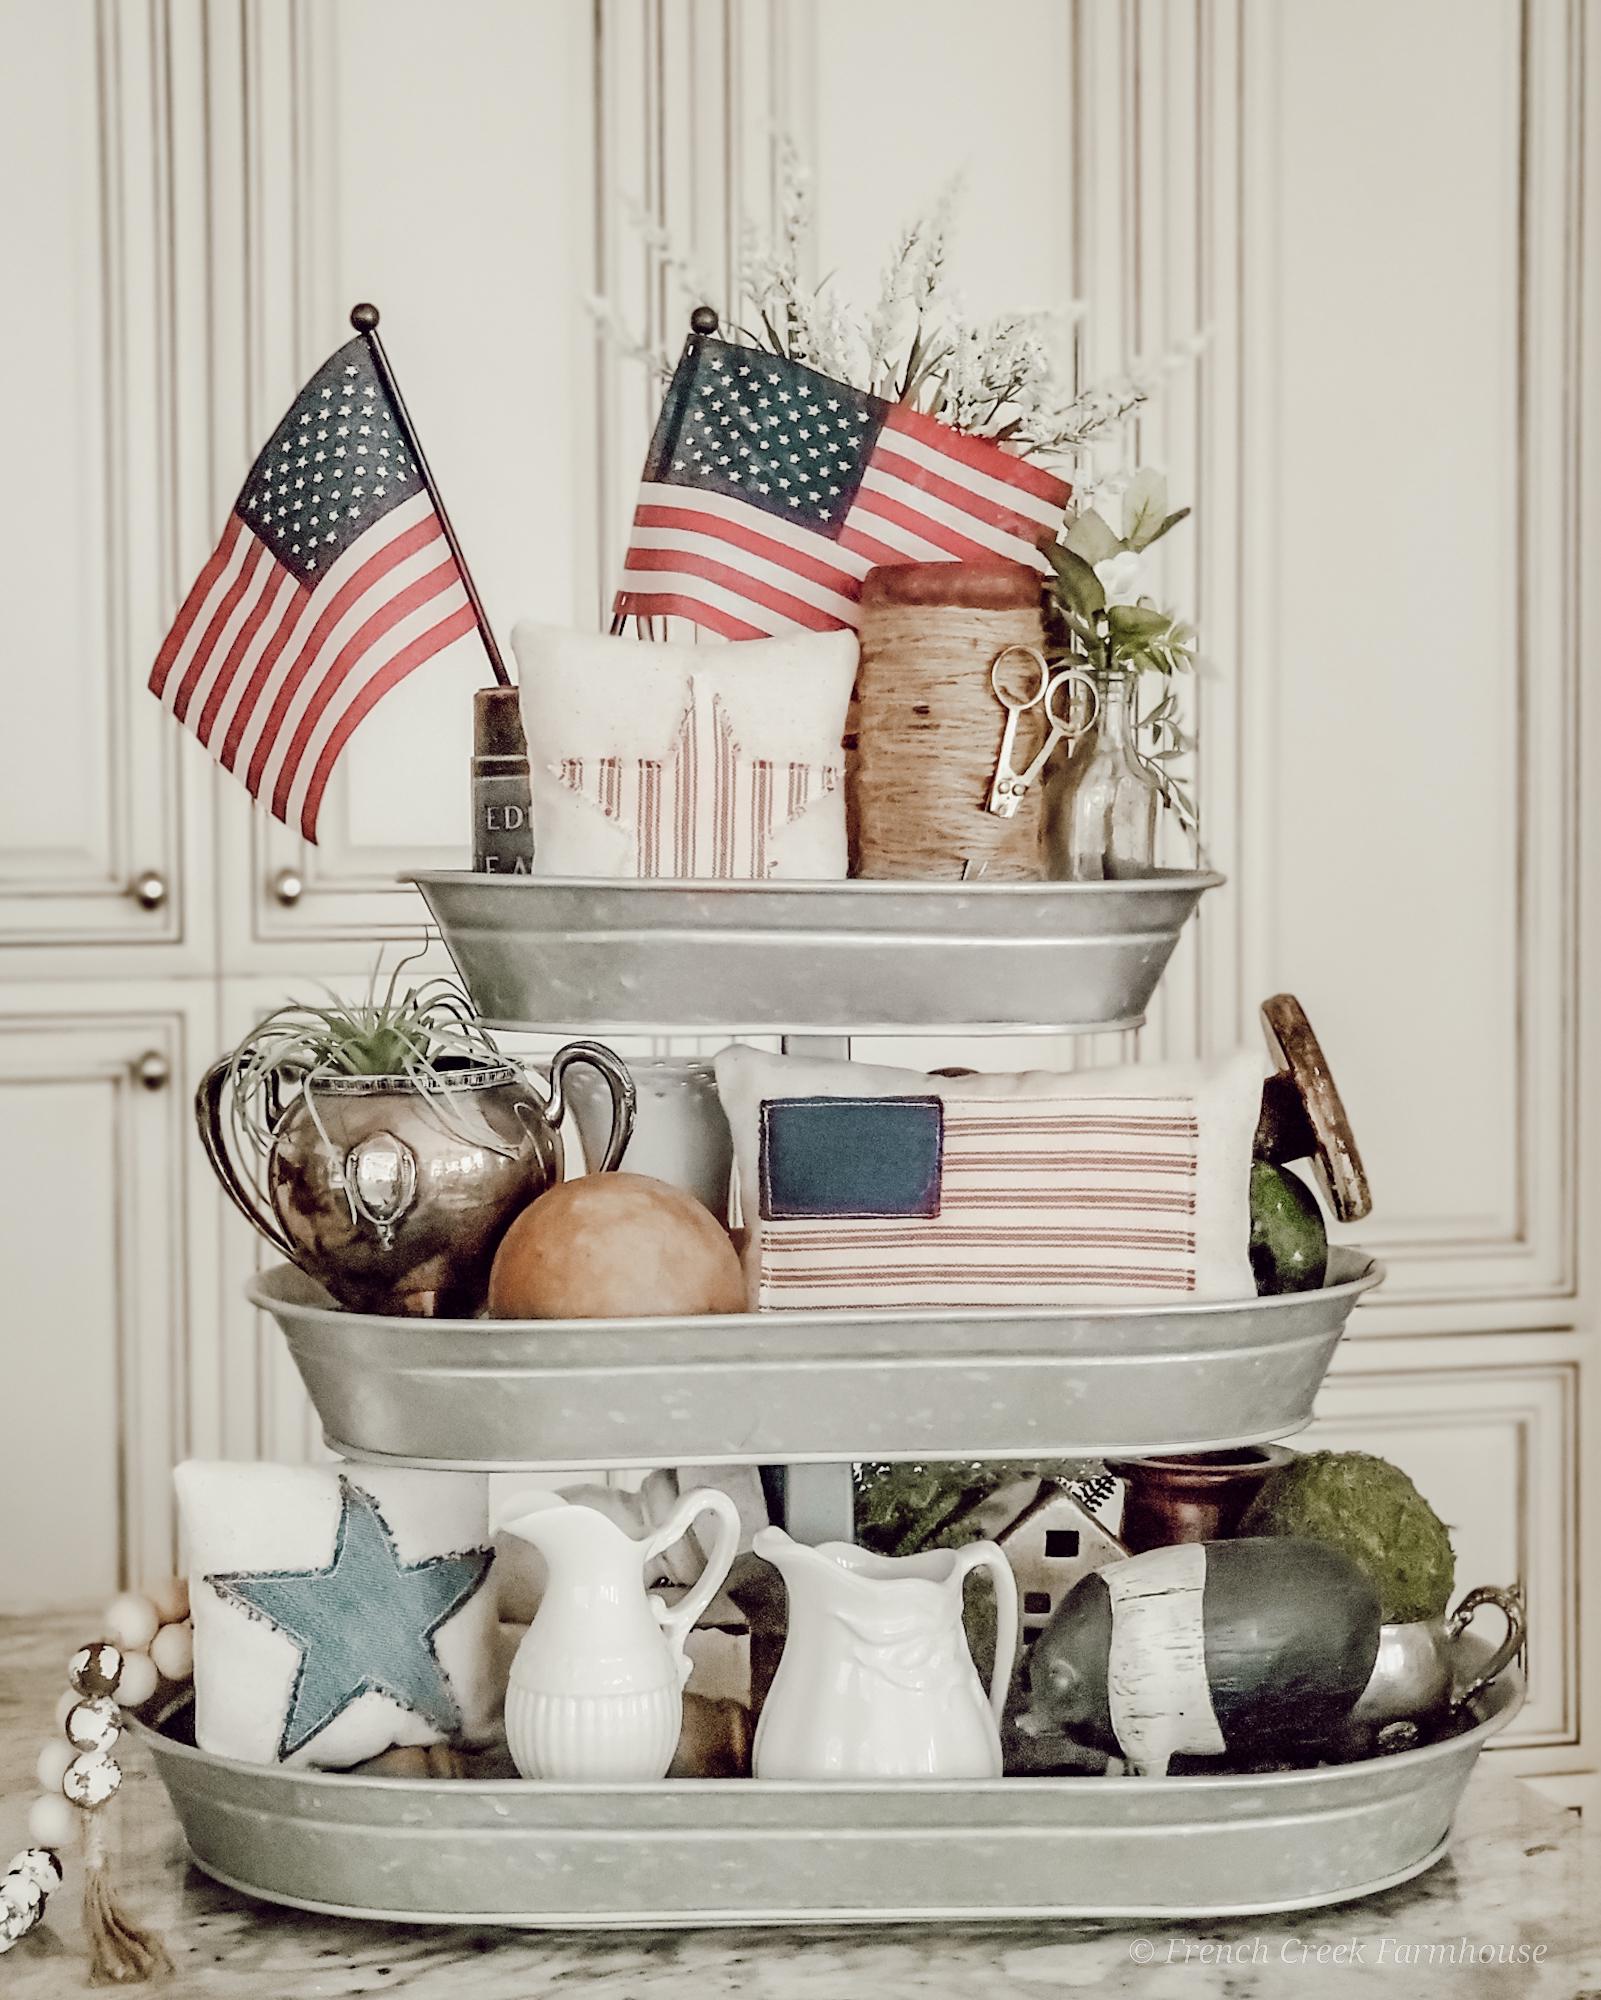 Three-tiered galvanized tray with vintage Americana decor